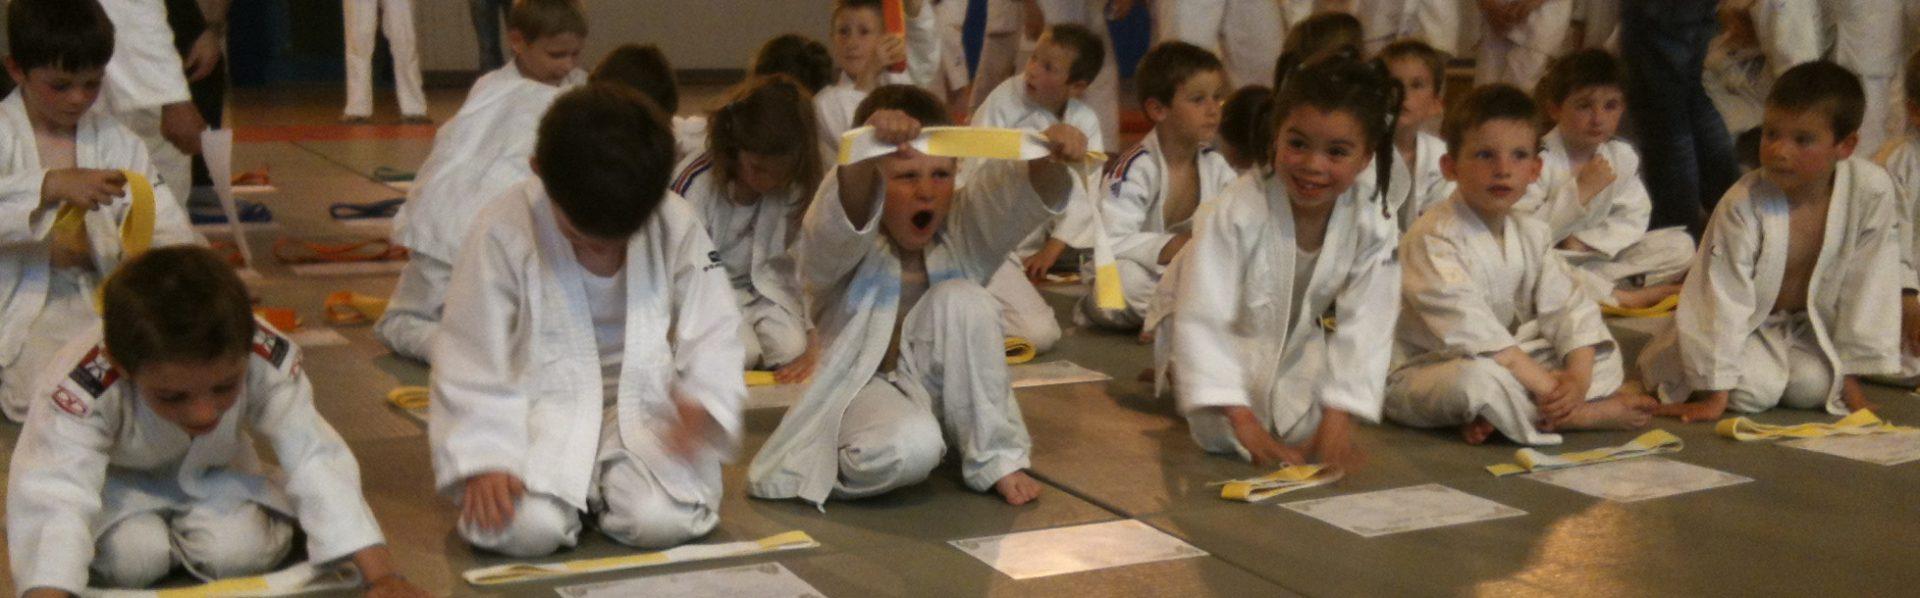 Judo Club Liffré   柔道